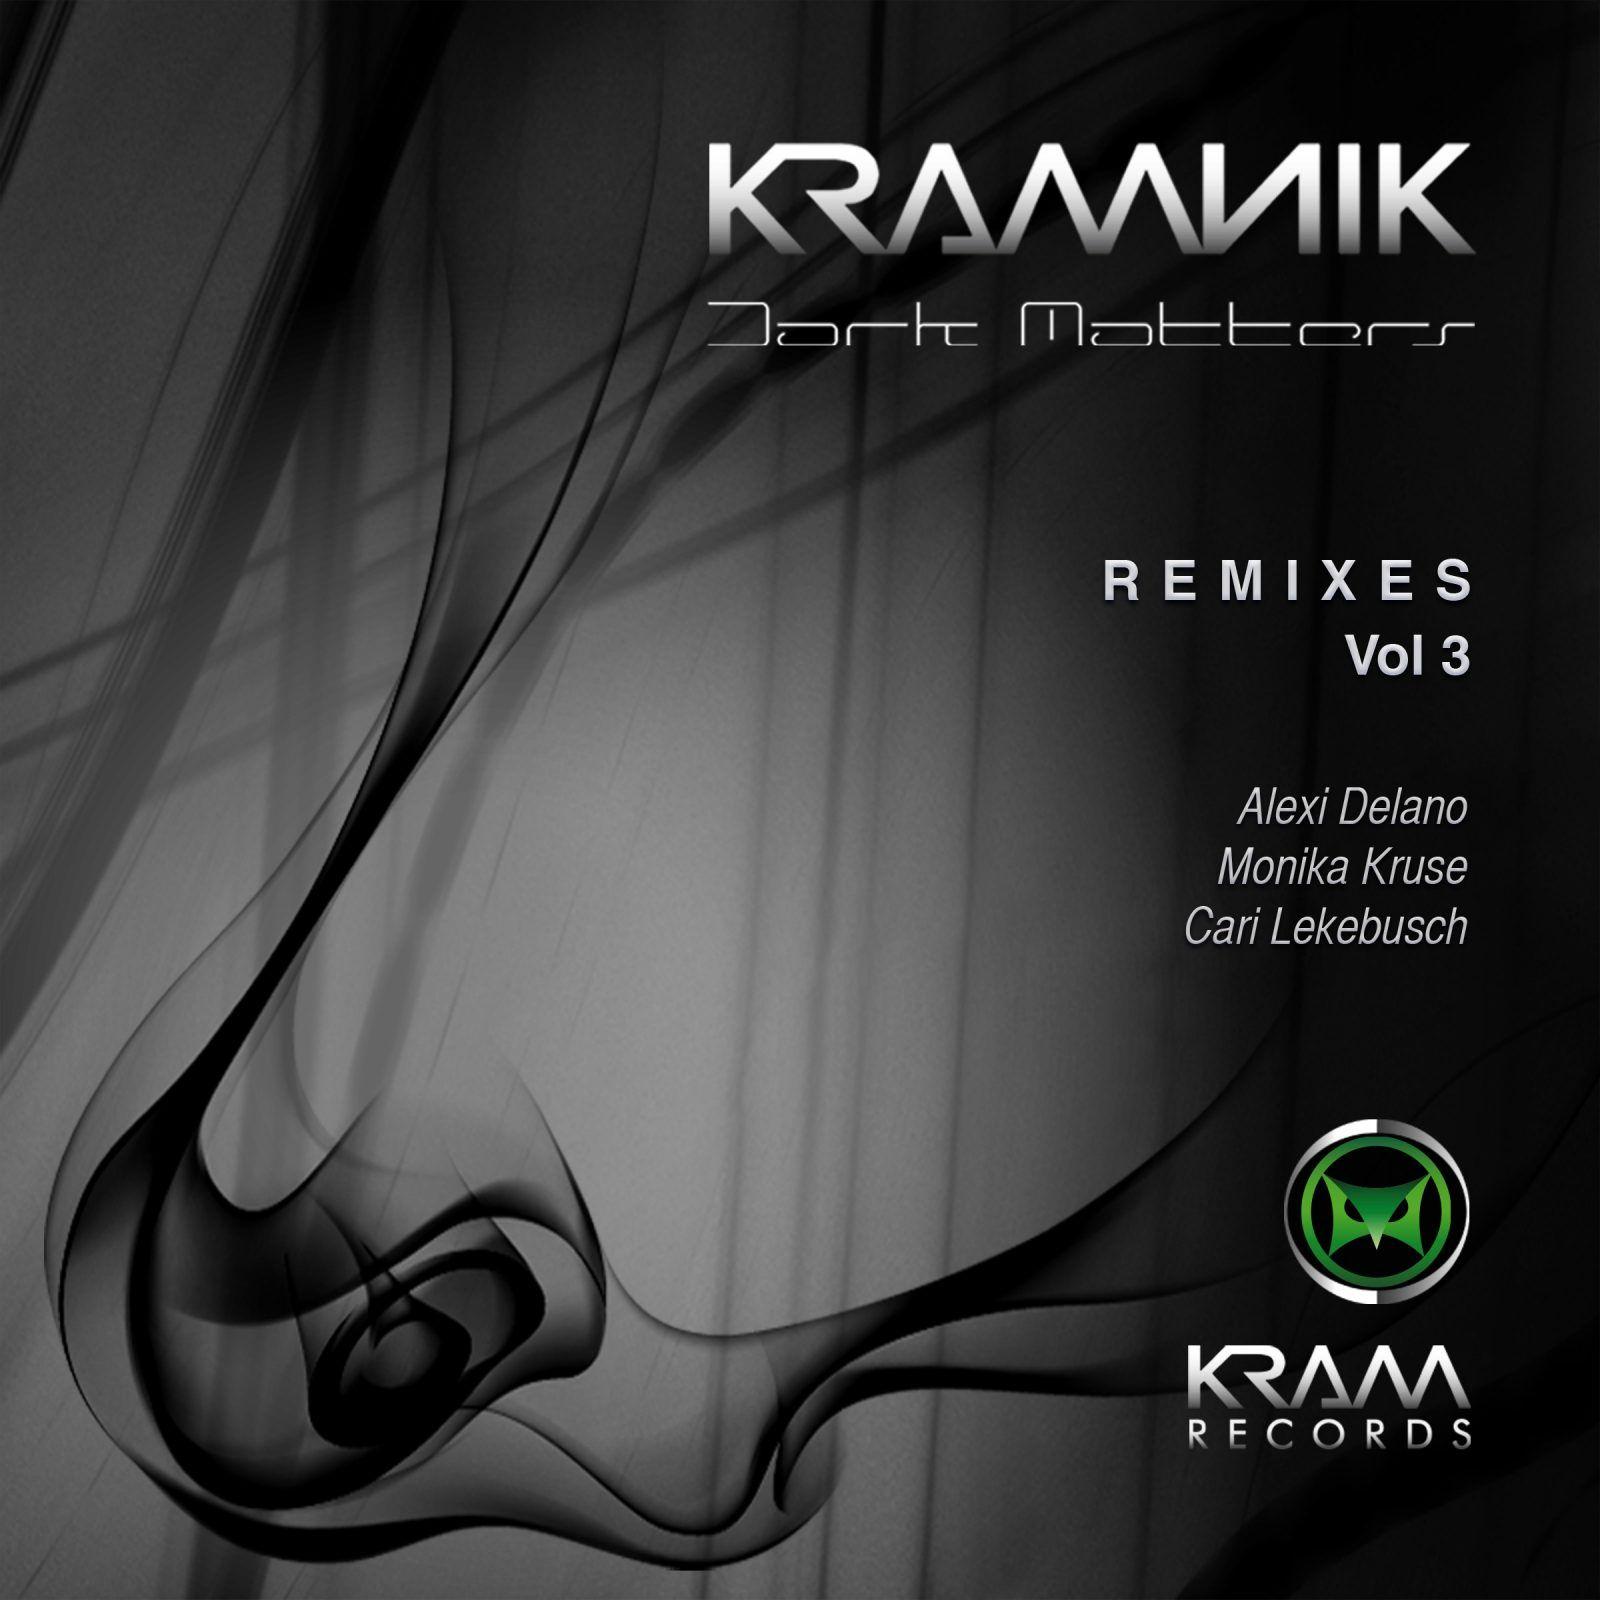 remixes-coversvol-3-p4.jpg